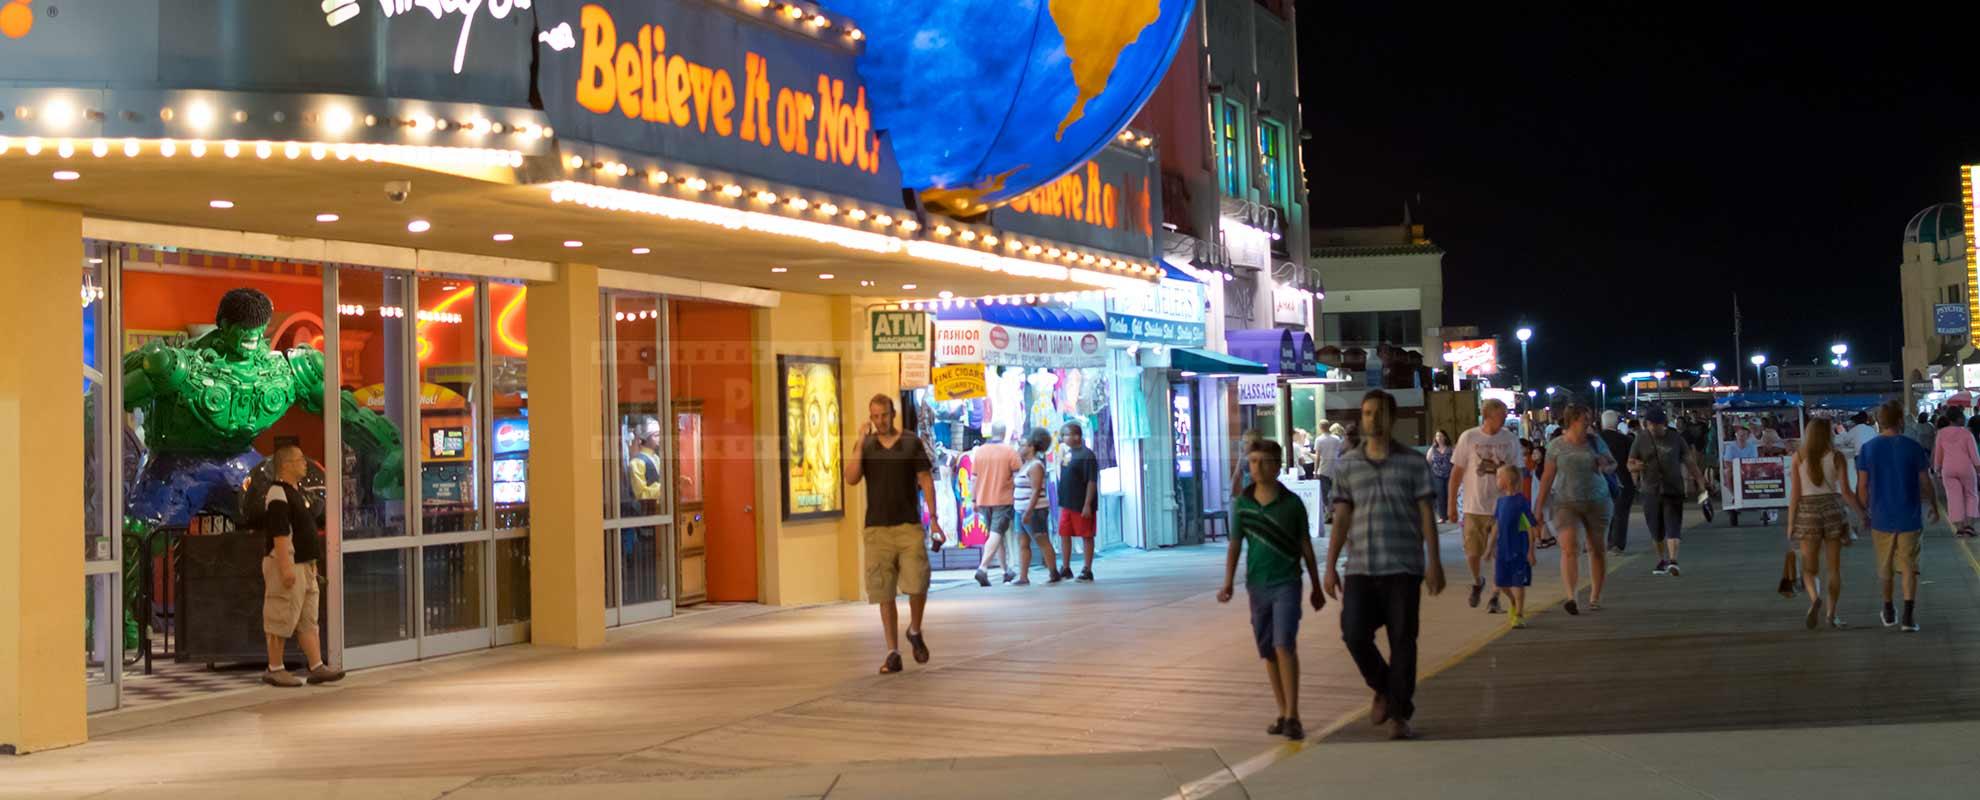 Atlantic City boardwalk full of people at night